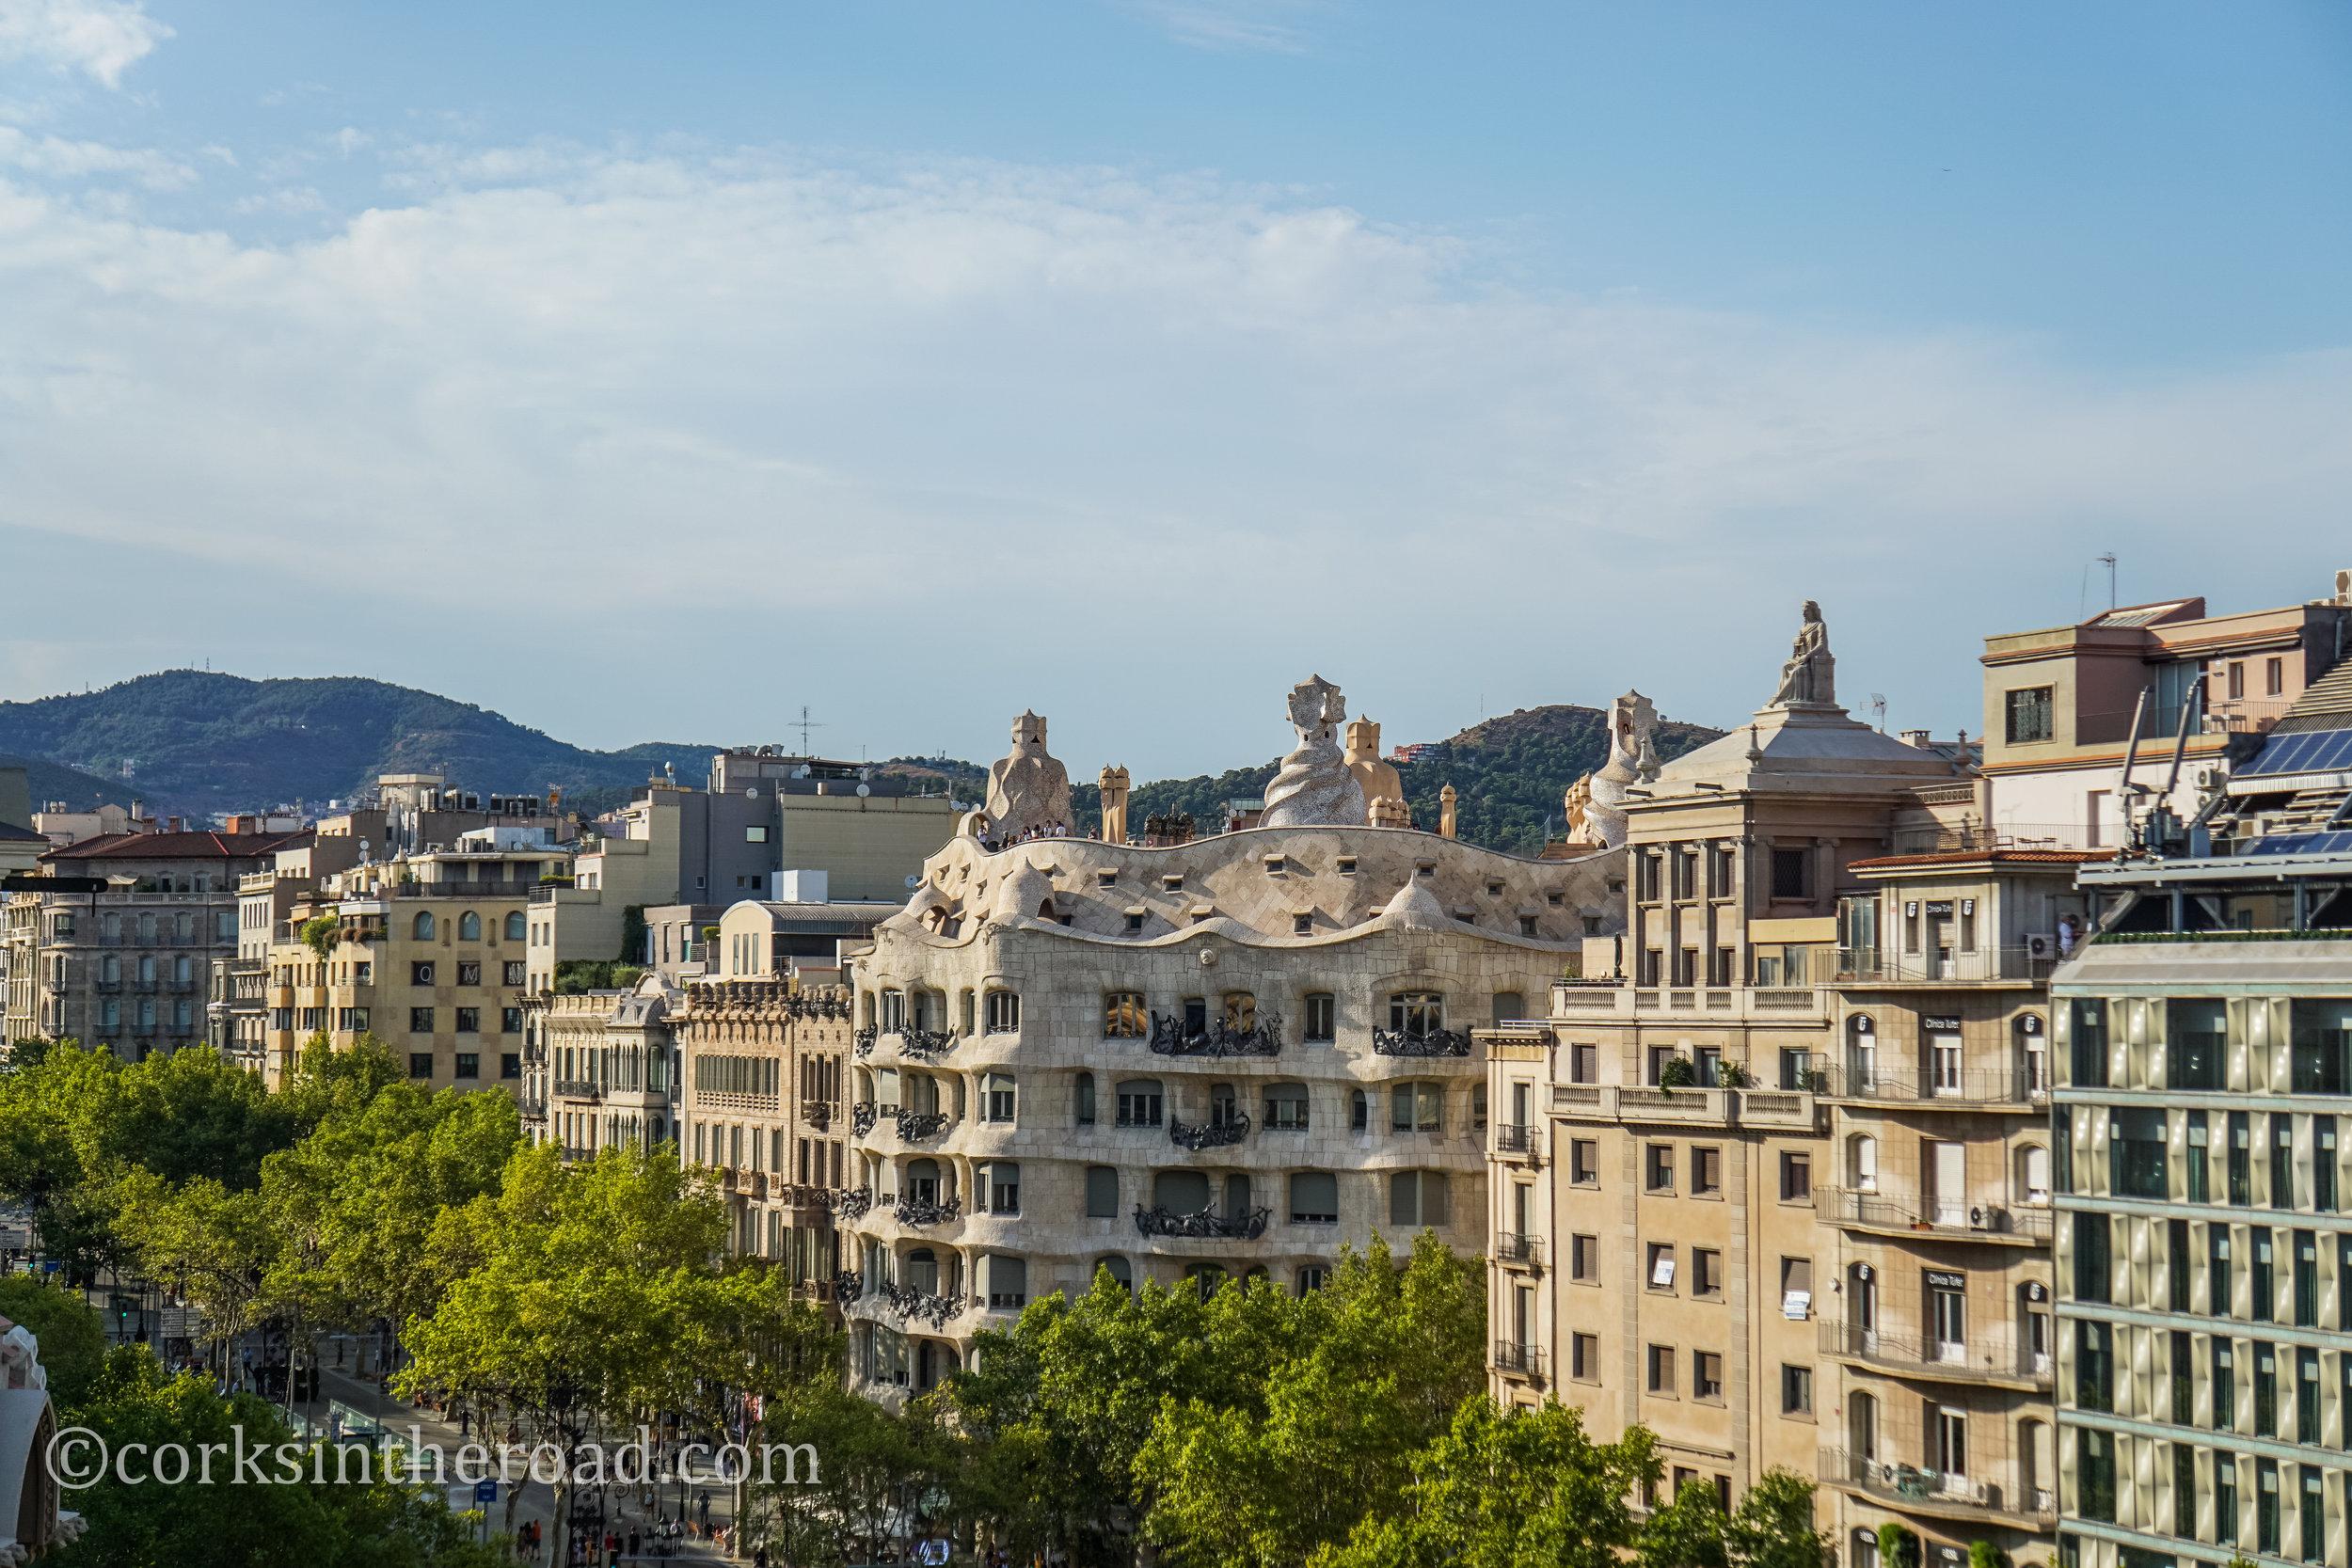 20160804Architecture, Barcelona, Corksintheroad, Rooftops.jpg